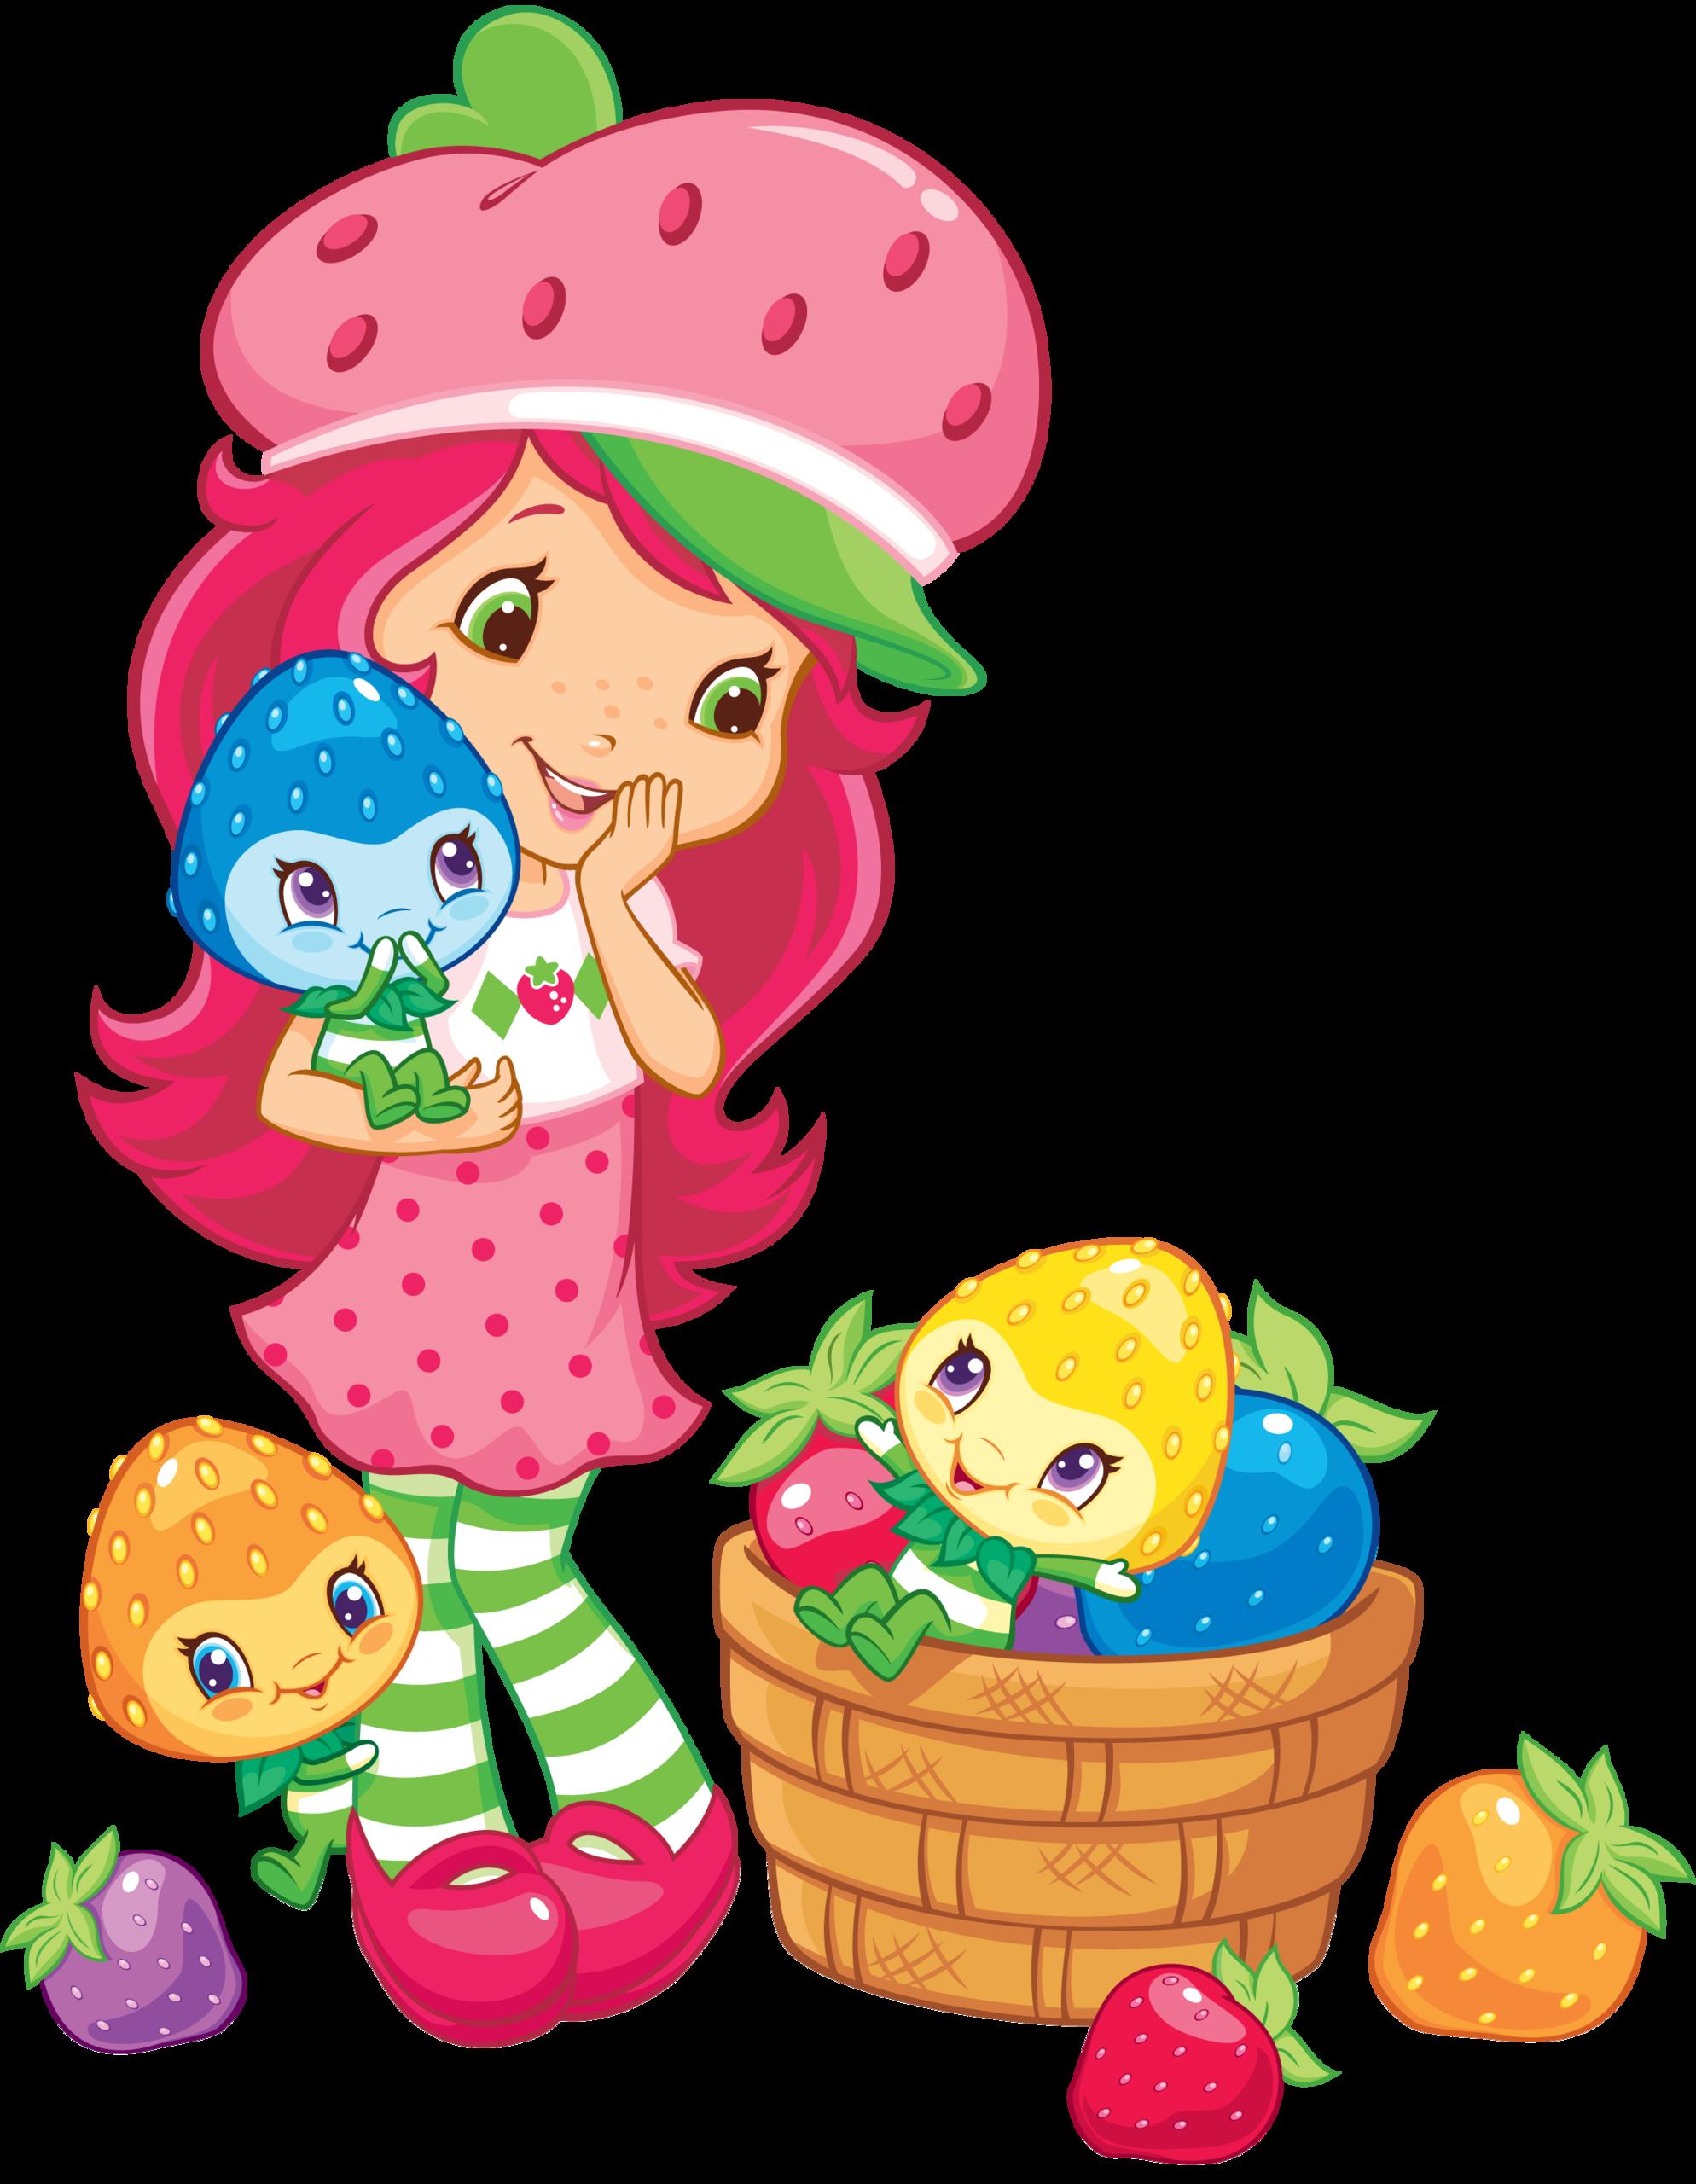 Strawberries clipart animasi. Strawberry shortcake wallpapers group